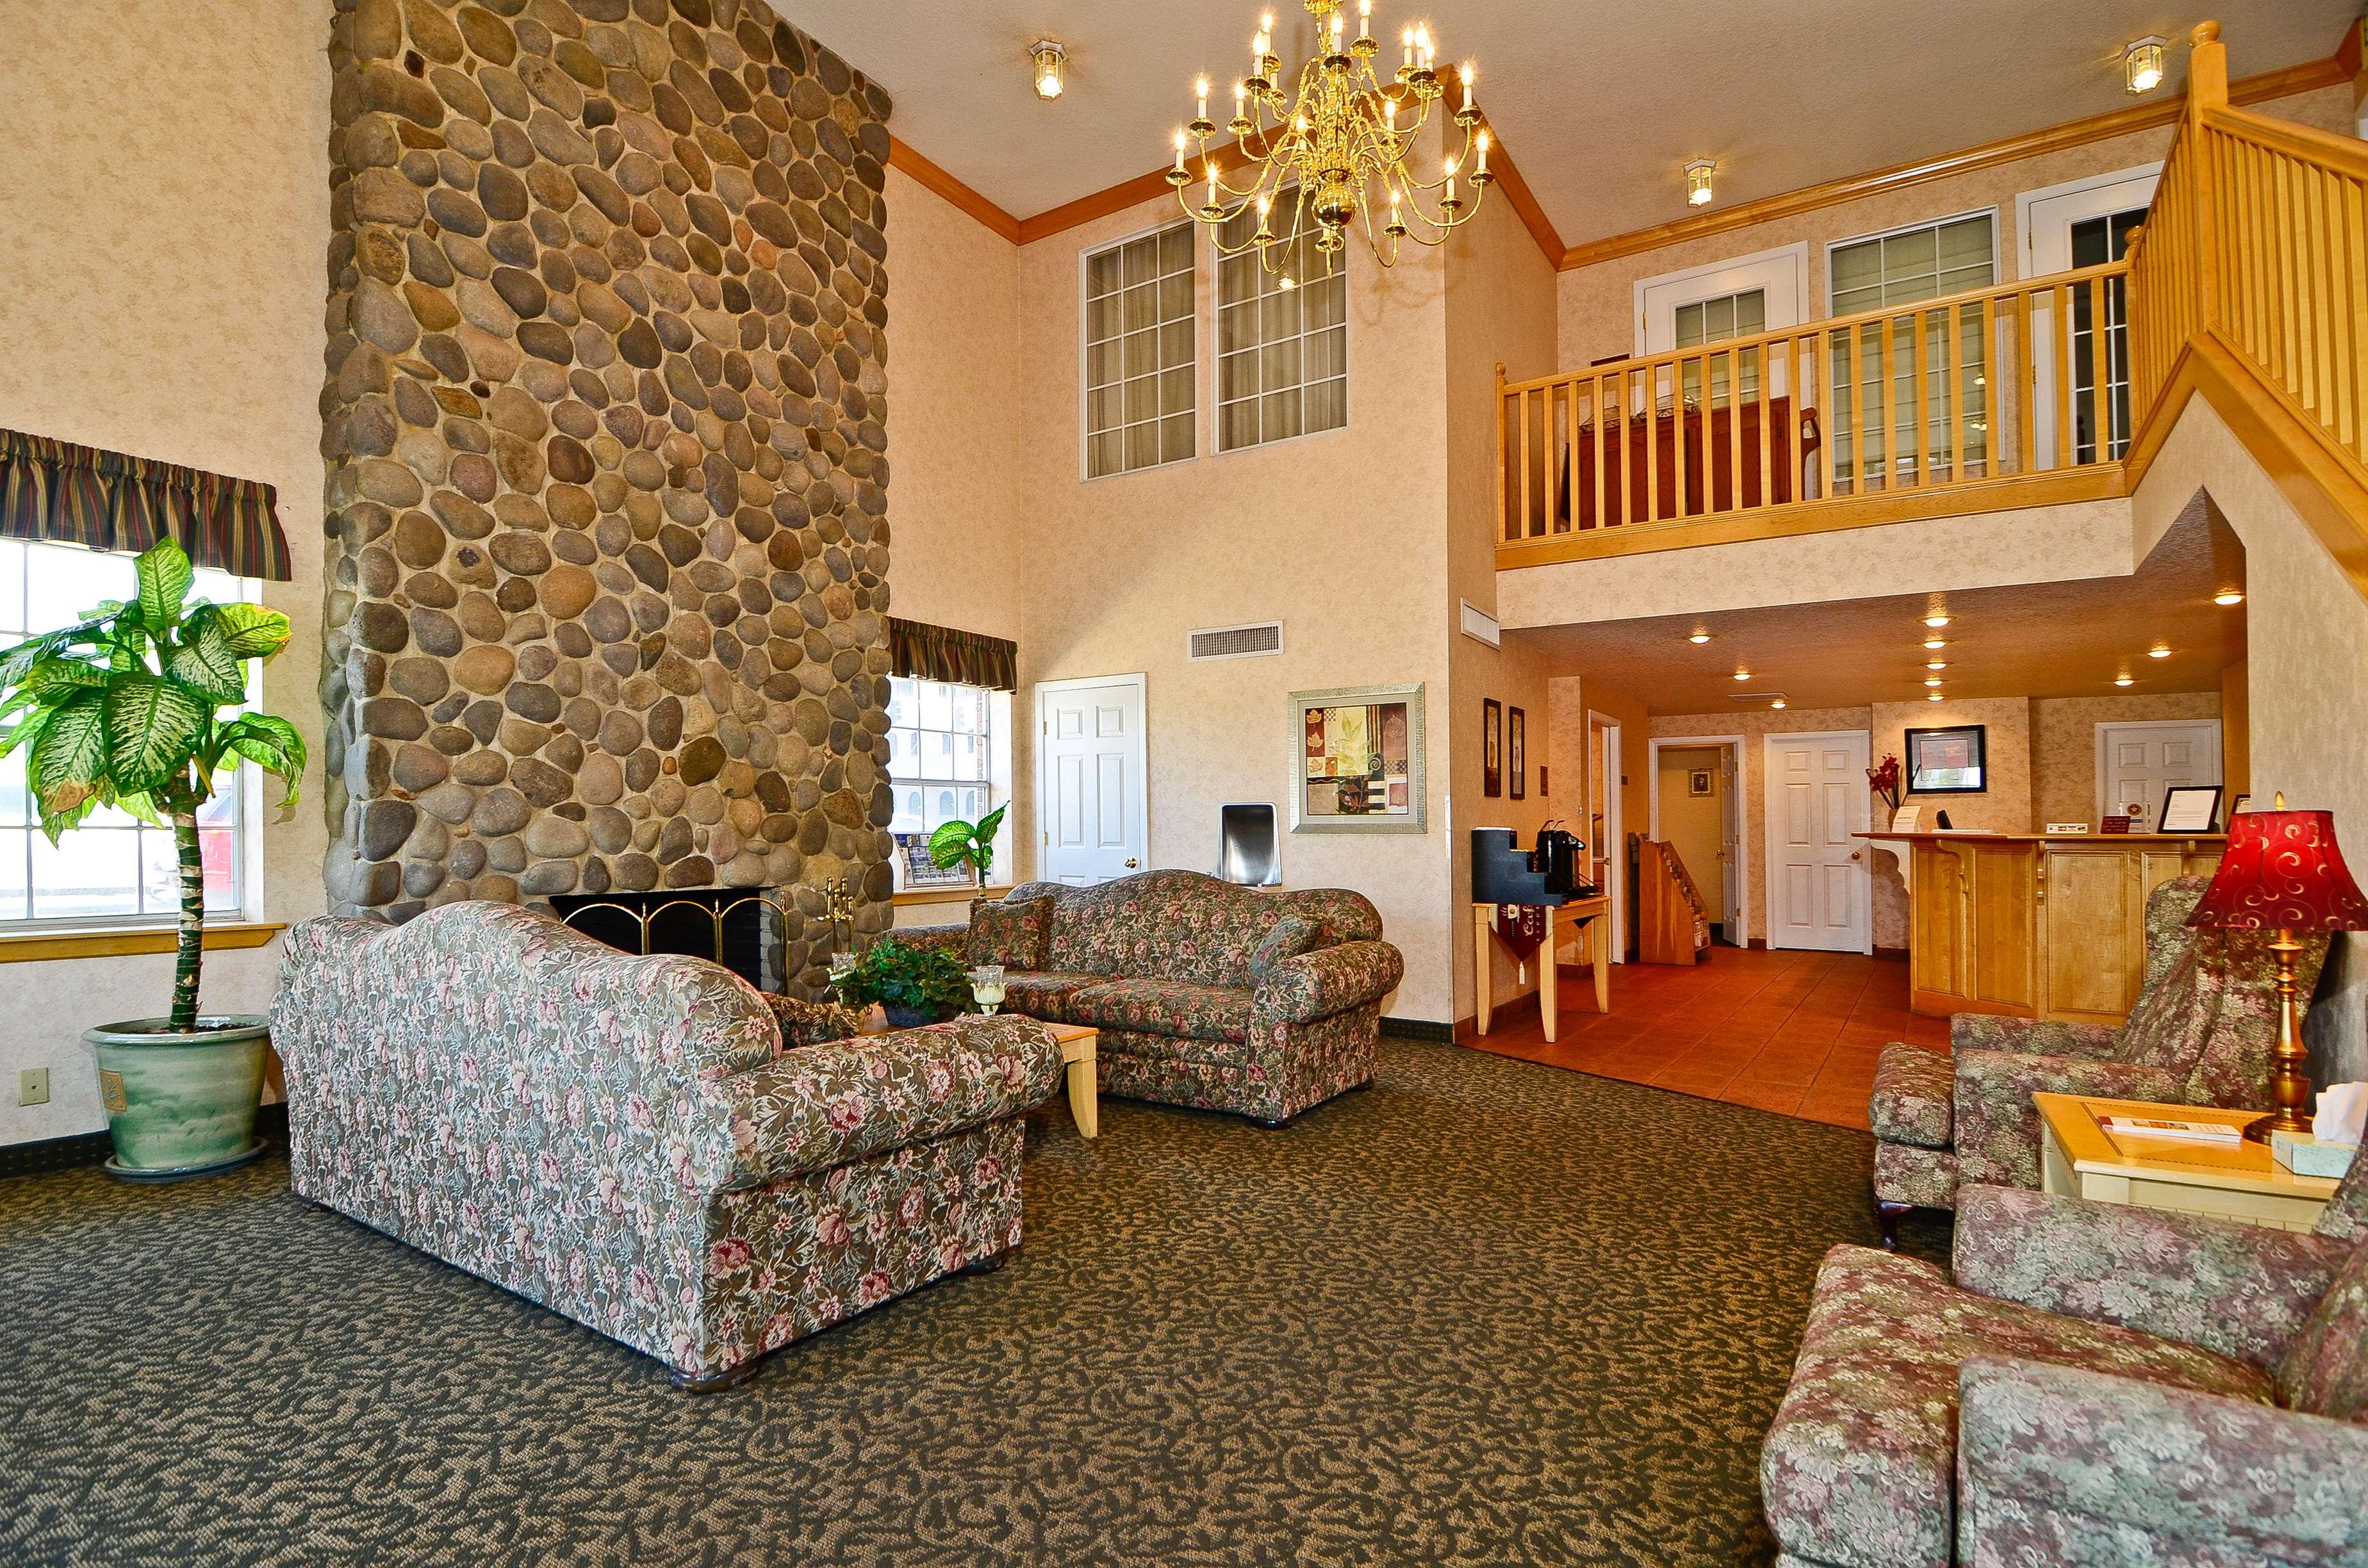 Best Western Horizon Inn image 41